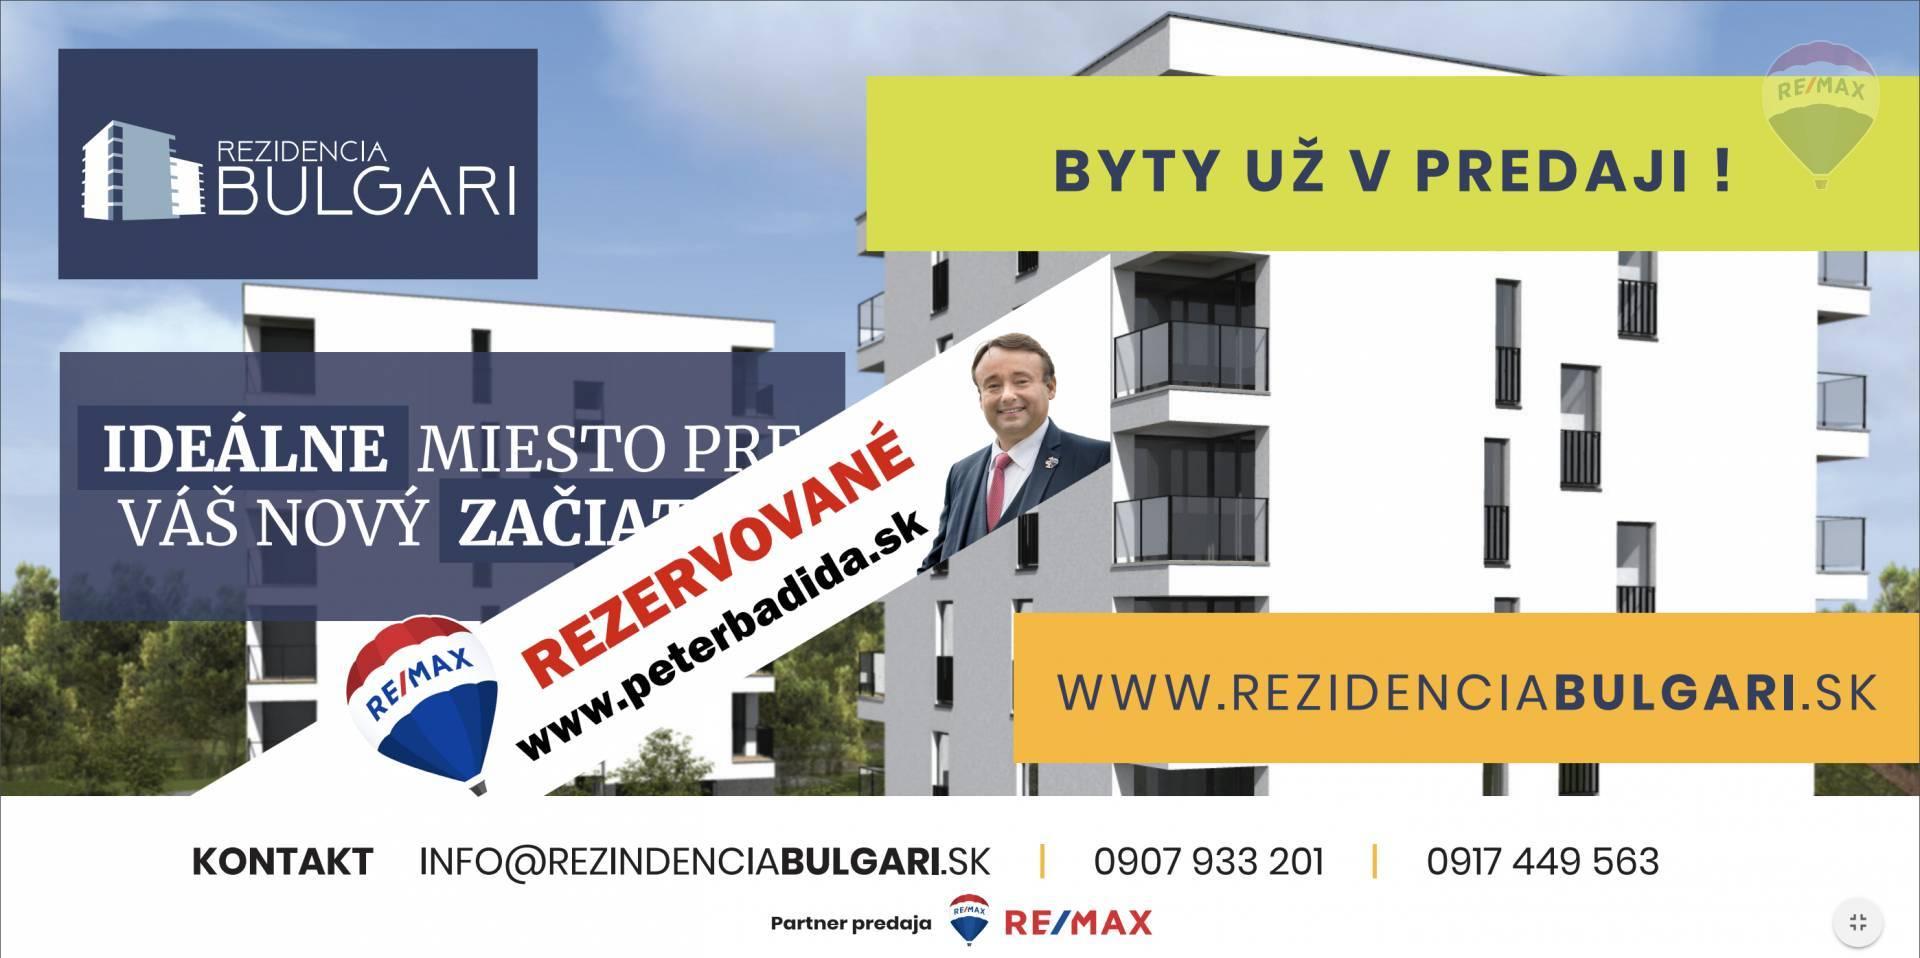 --- R E Z E R V O V A N É --- Na predaj 2 izbový byt Bulharská ulica v Prešove